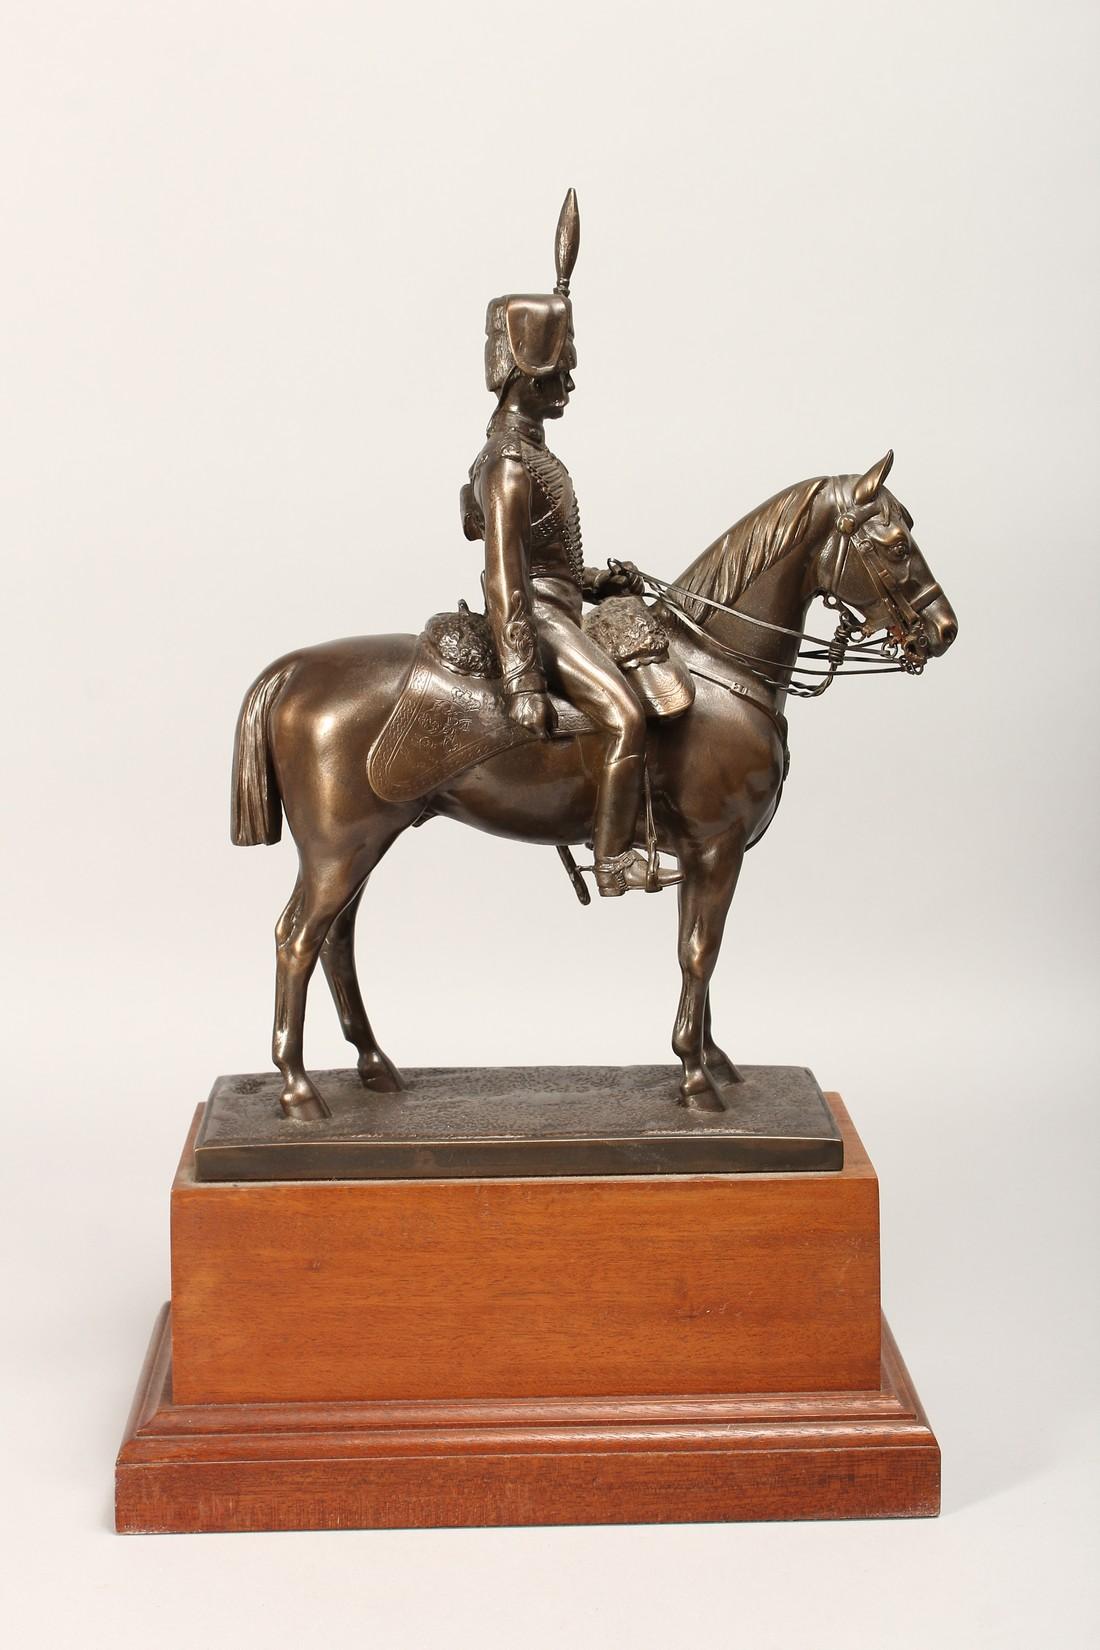 A BRONZE OVERLAID COMPOSITE MODEL OF A HUSSAR ON HORSEBACK, on a wooden plinth base 17ins high. - Image 3 of 4